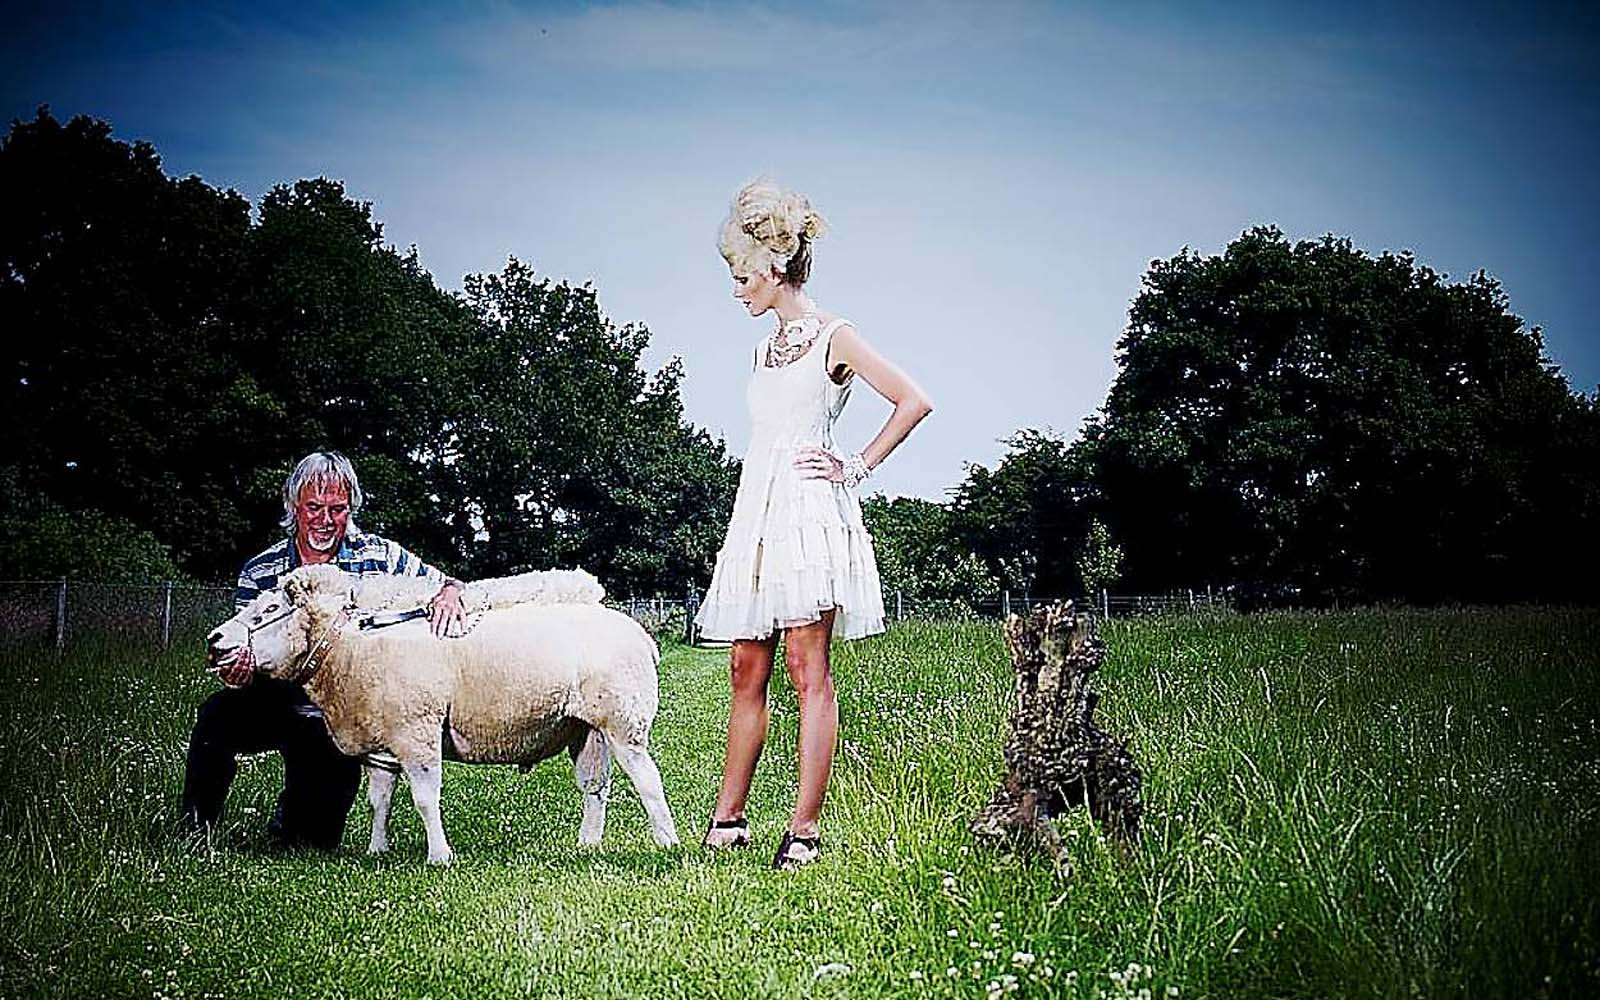 country-grunge-10p.jpg